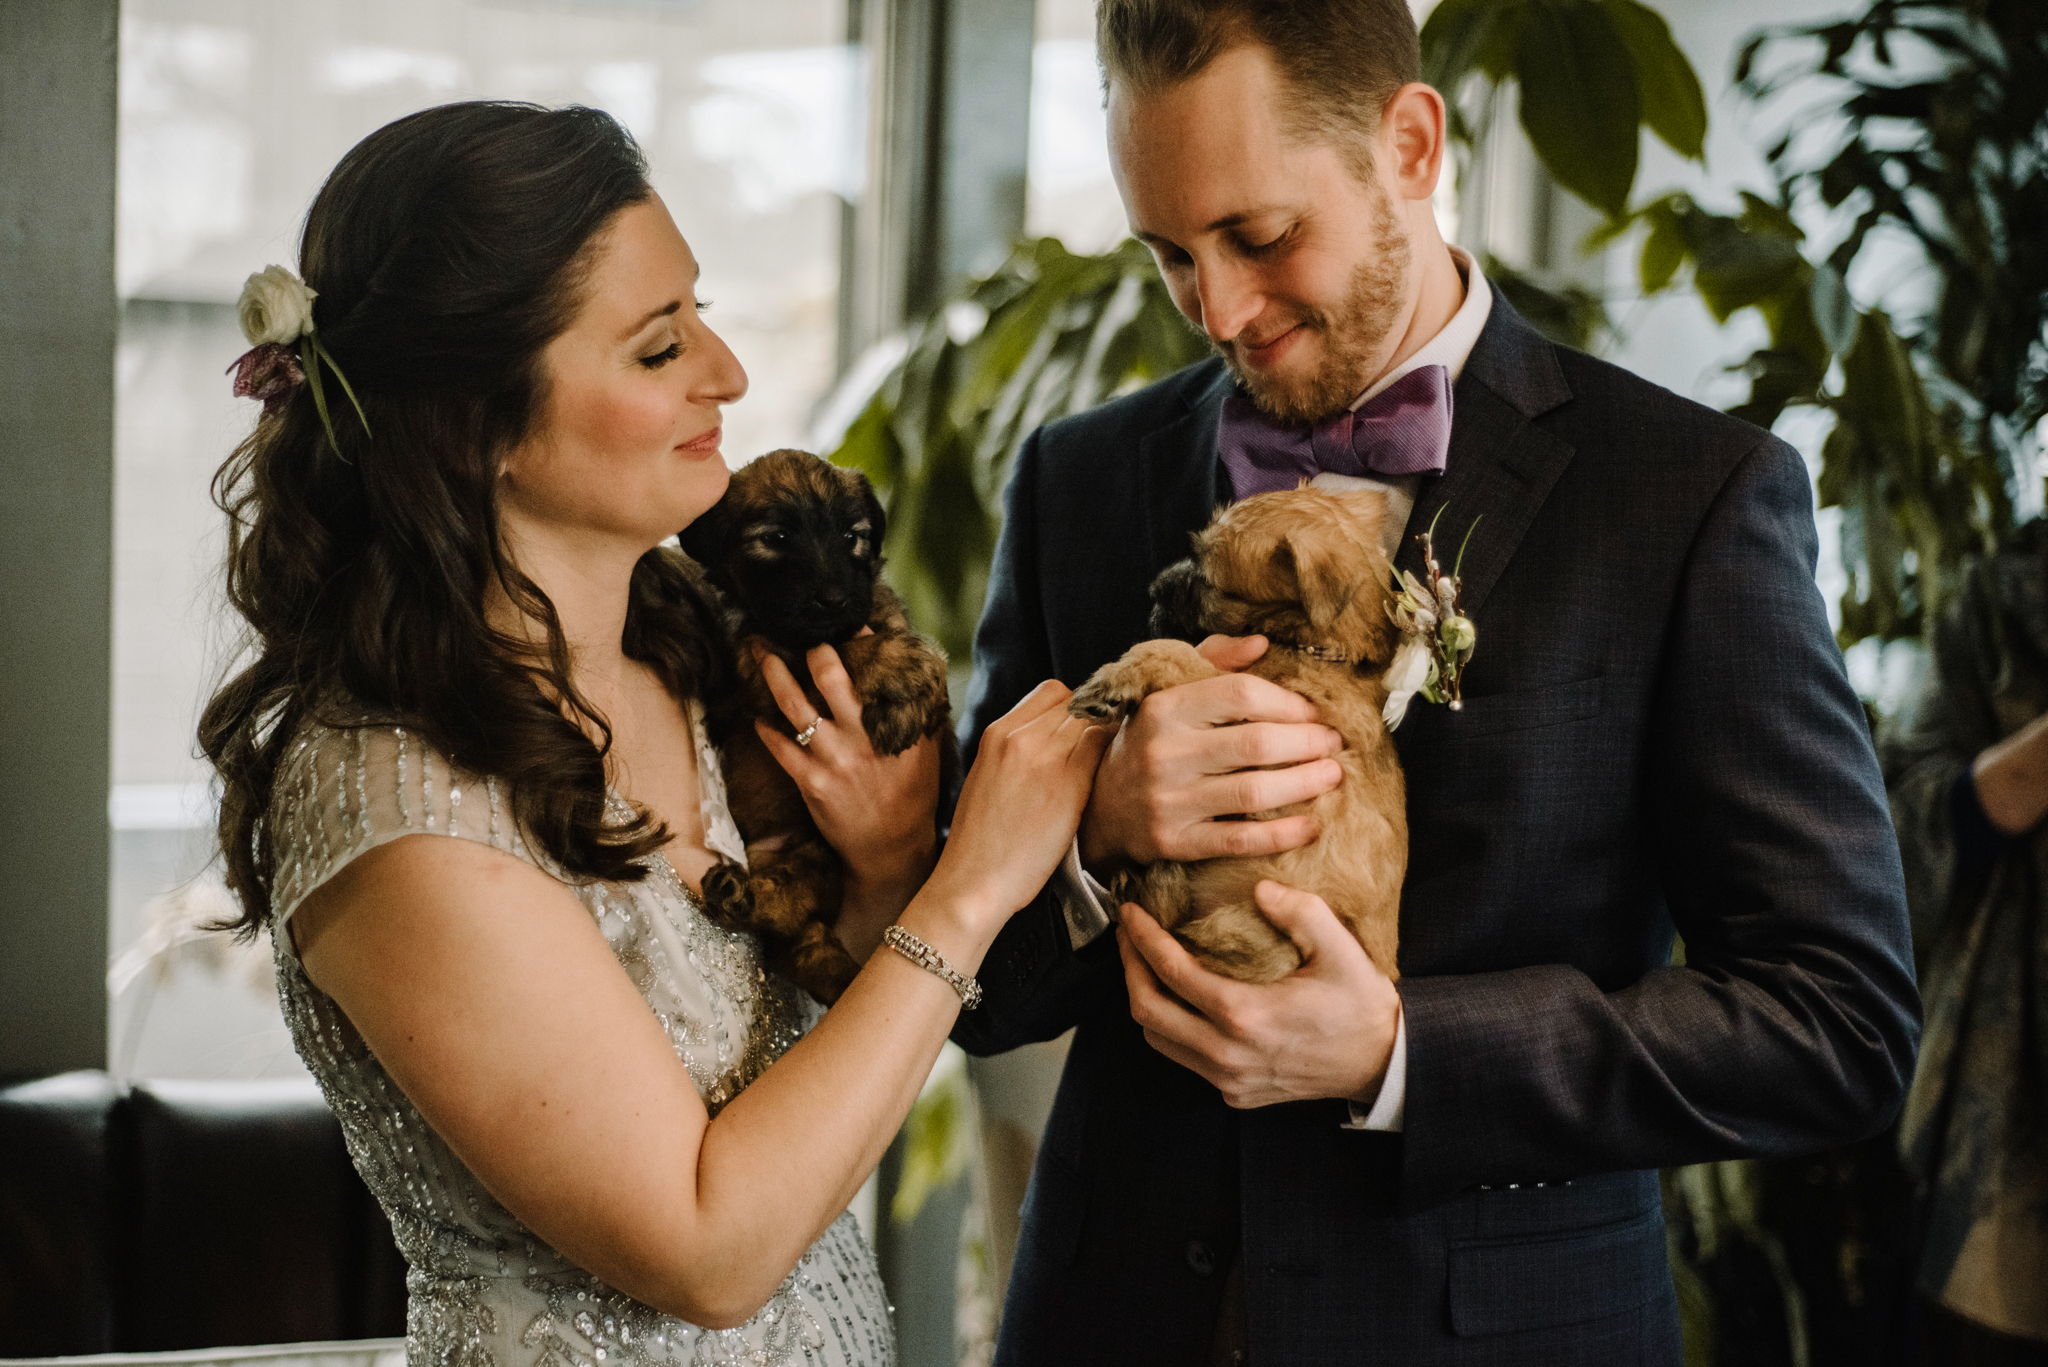 Intimate Dinner Wedding - Small Wedding with Candlelit Dinner - Sperryville Virginia Wedding - Backyard Wedding - Flourish Root Wedding Flowers - White Sails Creative Wedding - Cozy Wedding - Casual Wedding - Intimate Wedding_20.jpg